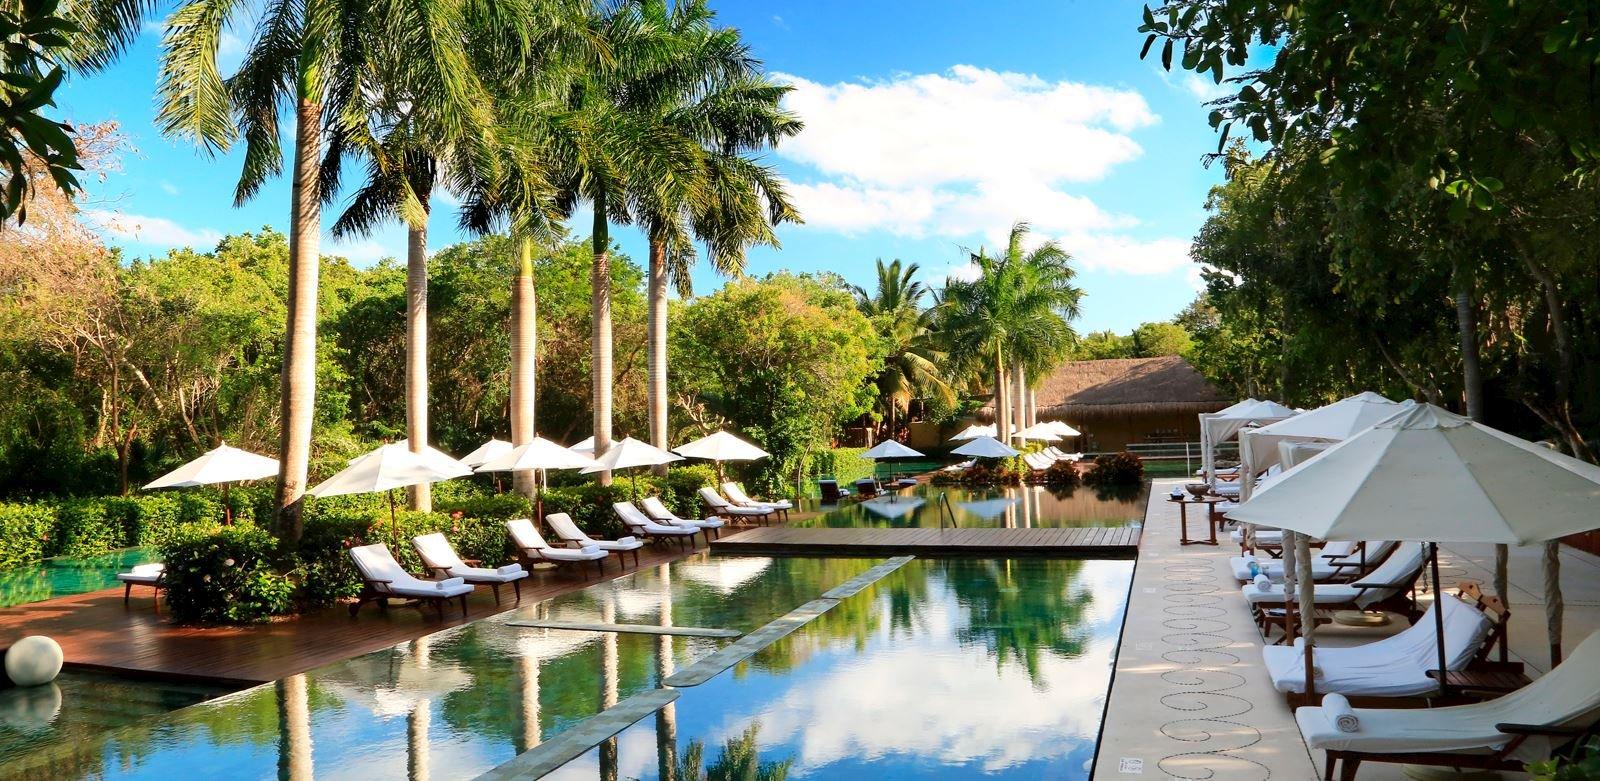 grand-velas-riviera-maya-mexico-home1-top